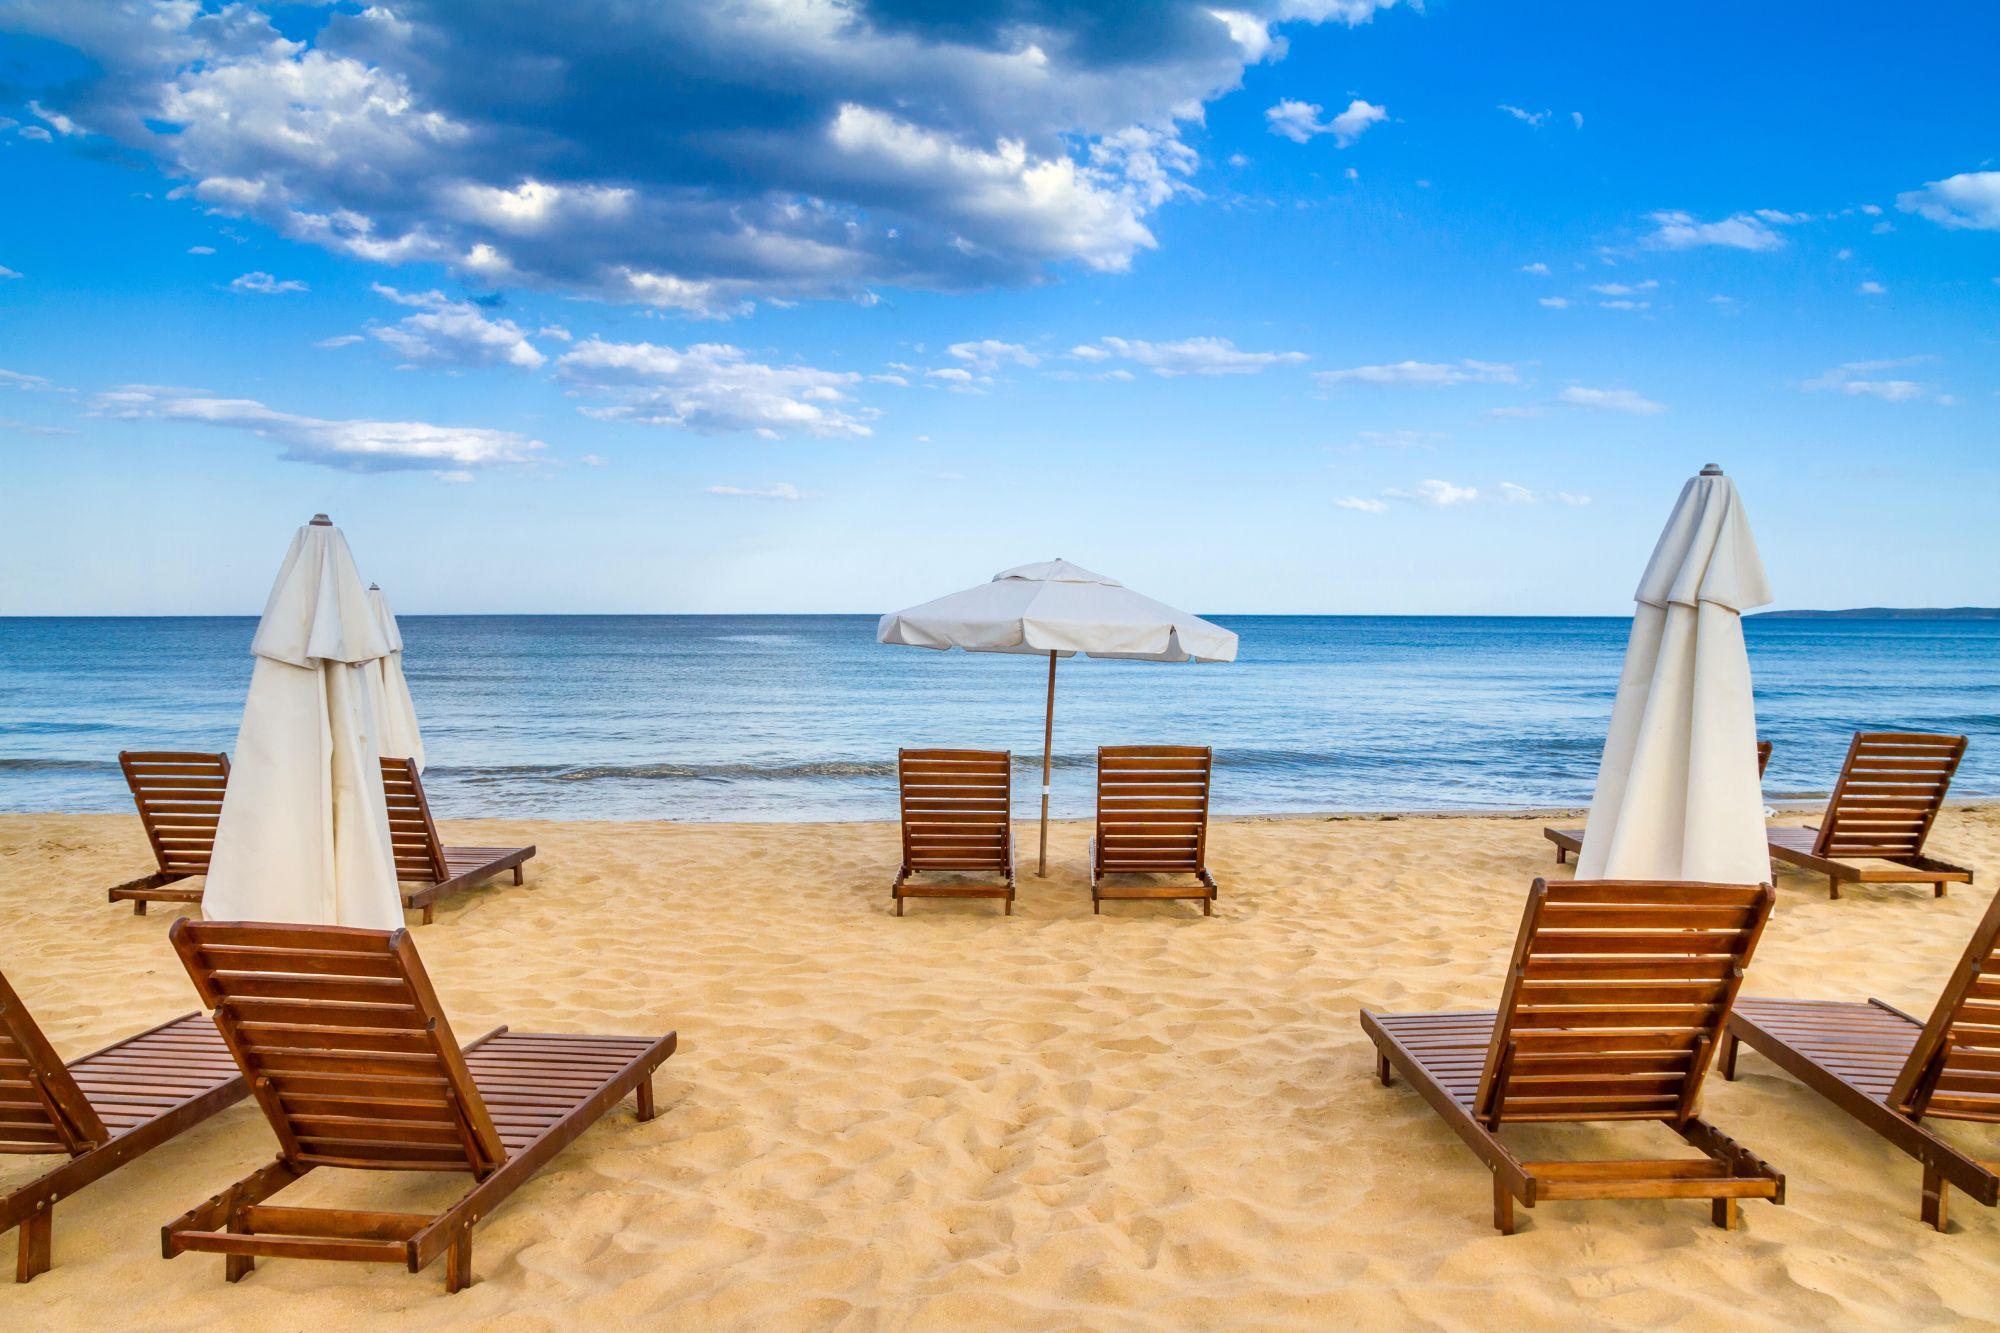 Burgas widok plaży